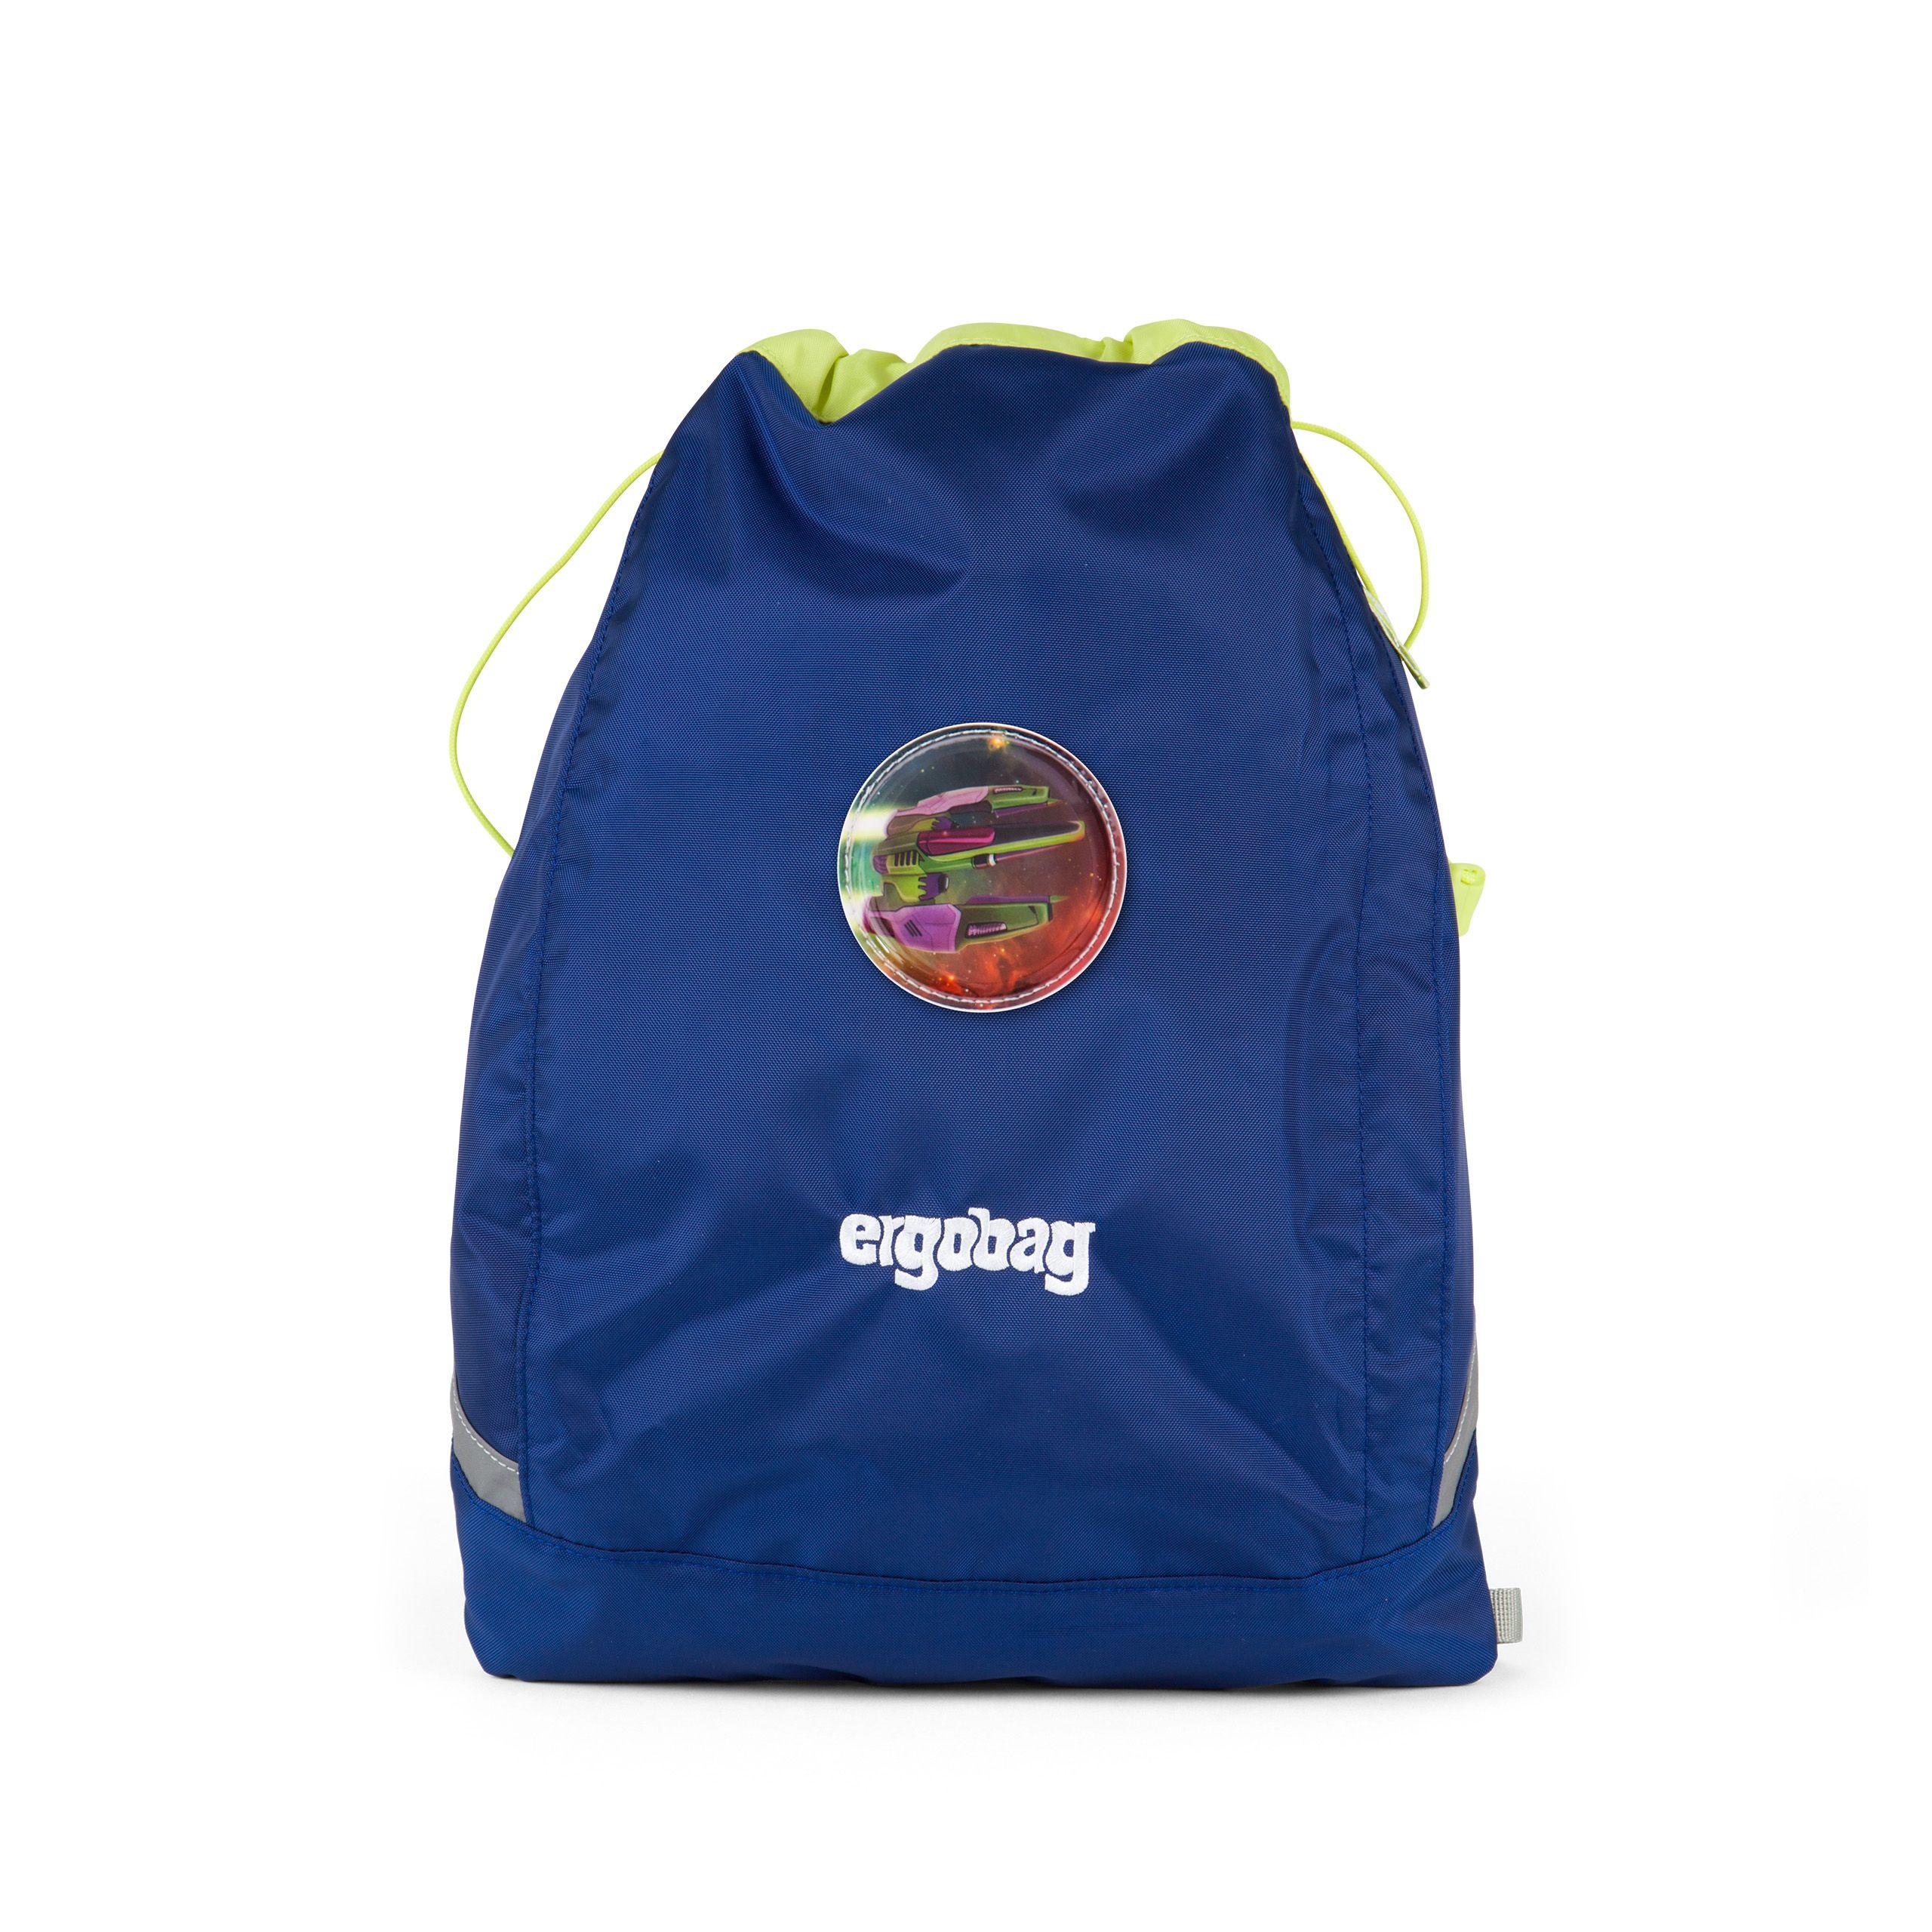 Image of Gym bag til Ergobag Cubo - OutBEARspace (ERG-CSP-001-301)